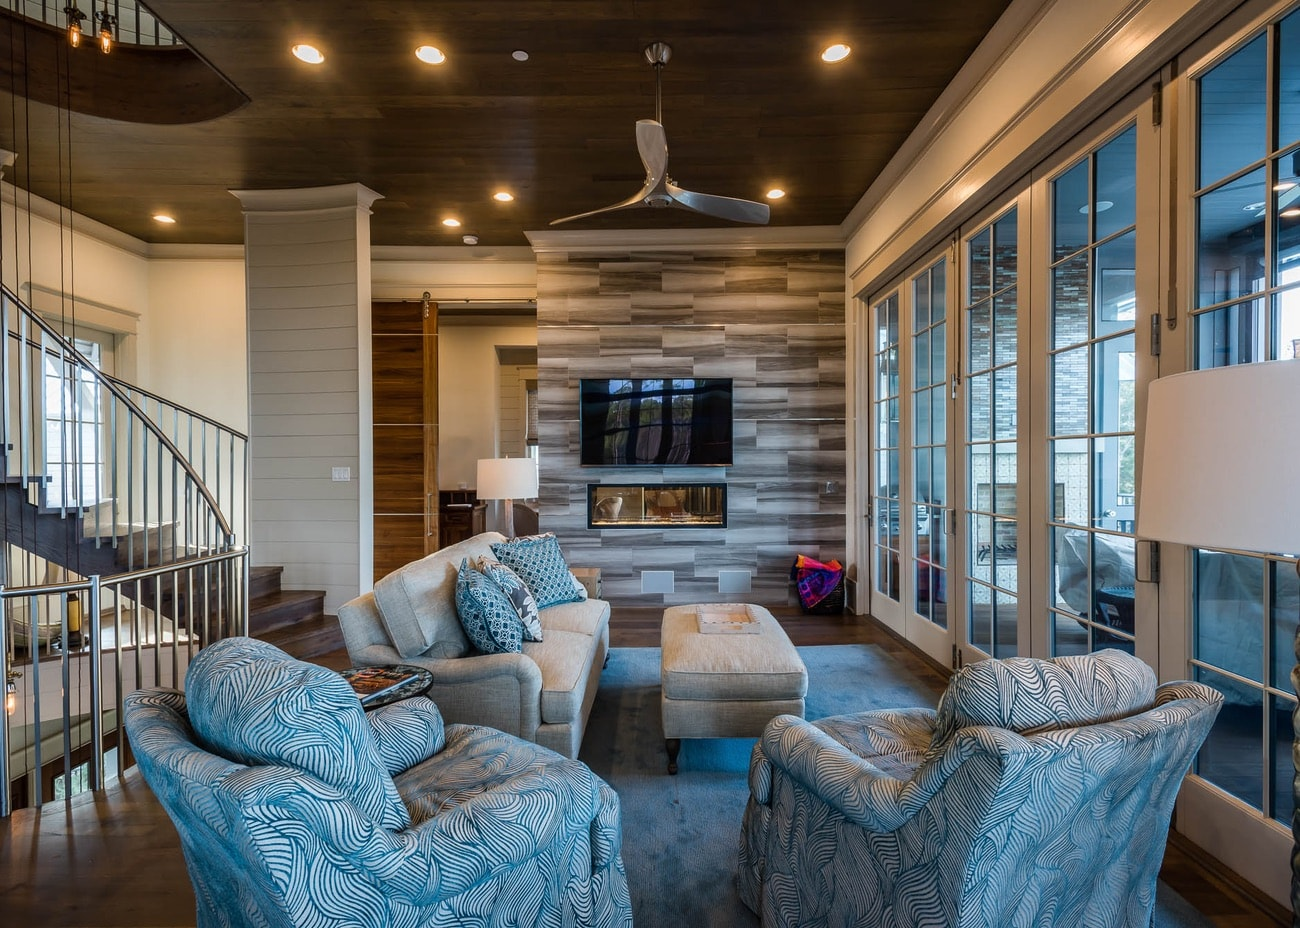 Custom Home Interior Design By Sugar Beach Interiors, Santa Rosa Beach,  Florida, Watercolor